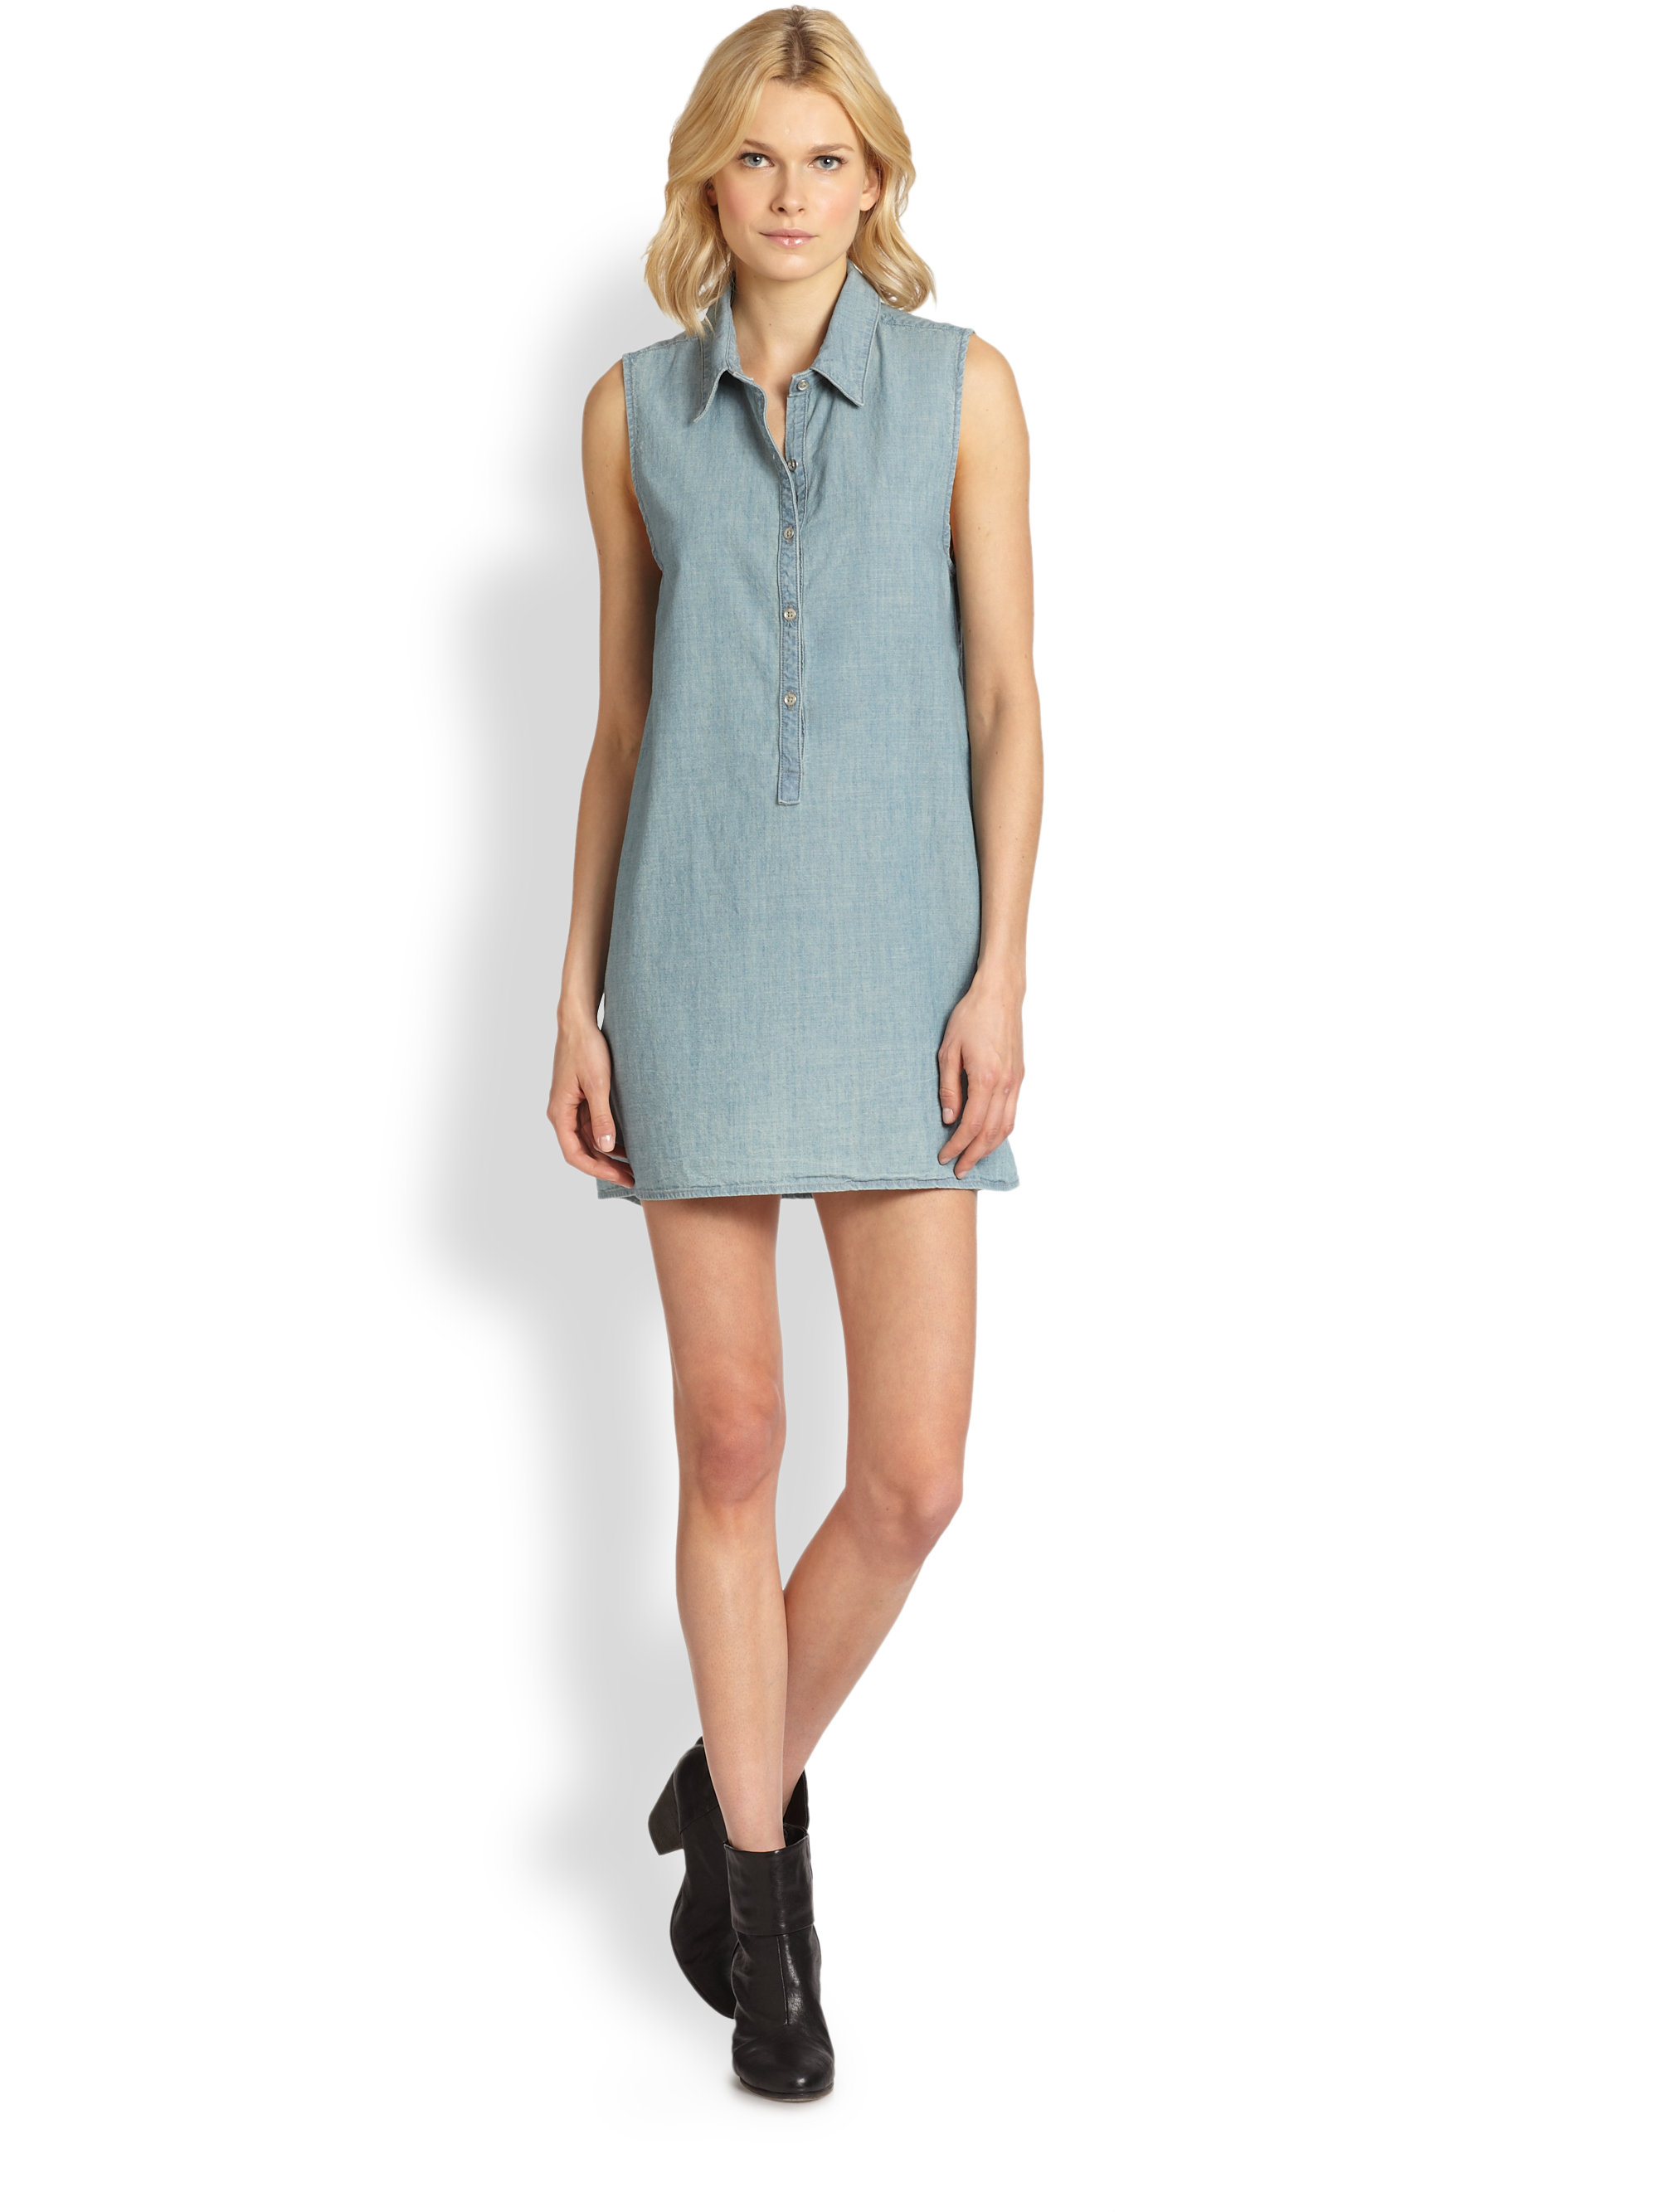 8103840fd1c Rag & Bone Sleeveless Denim Shirtdress in Blue - Lyst